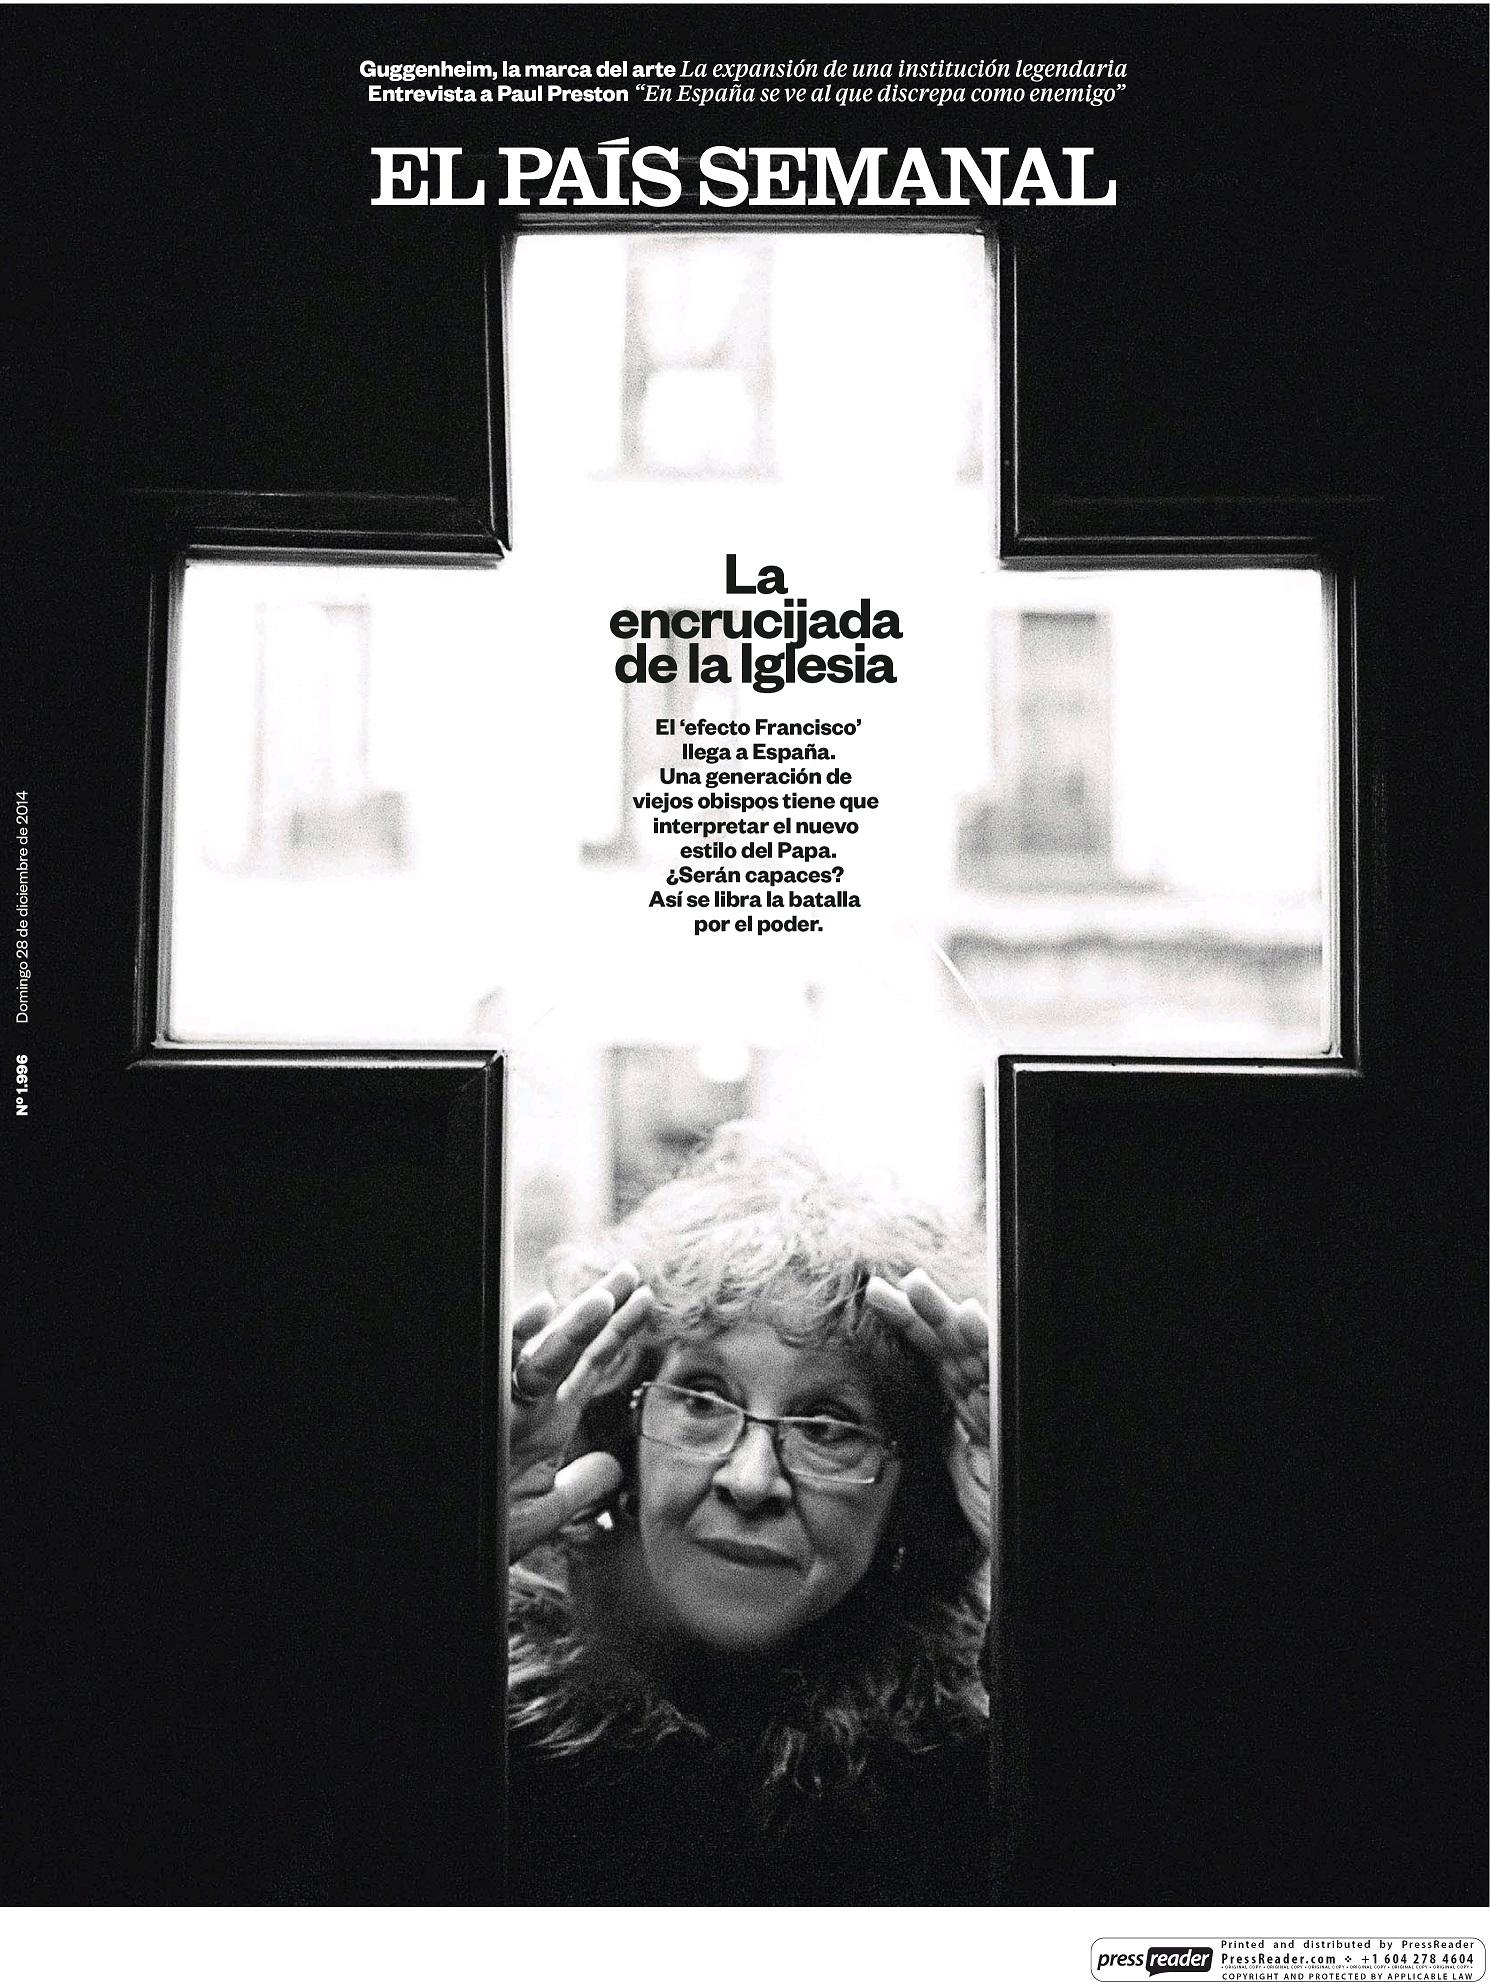 PAIS SEMANAL portada 28 de Diciembre 2014